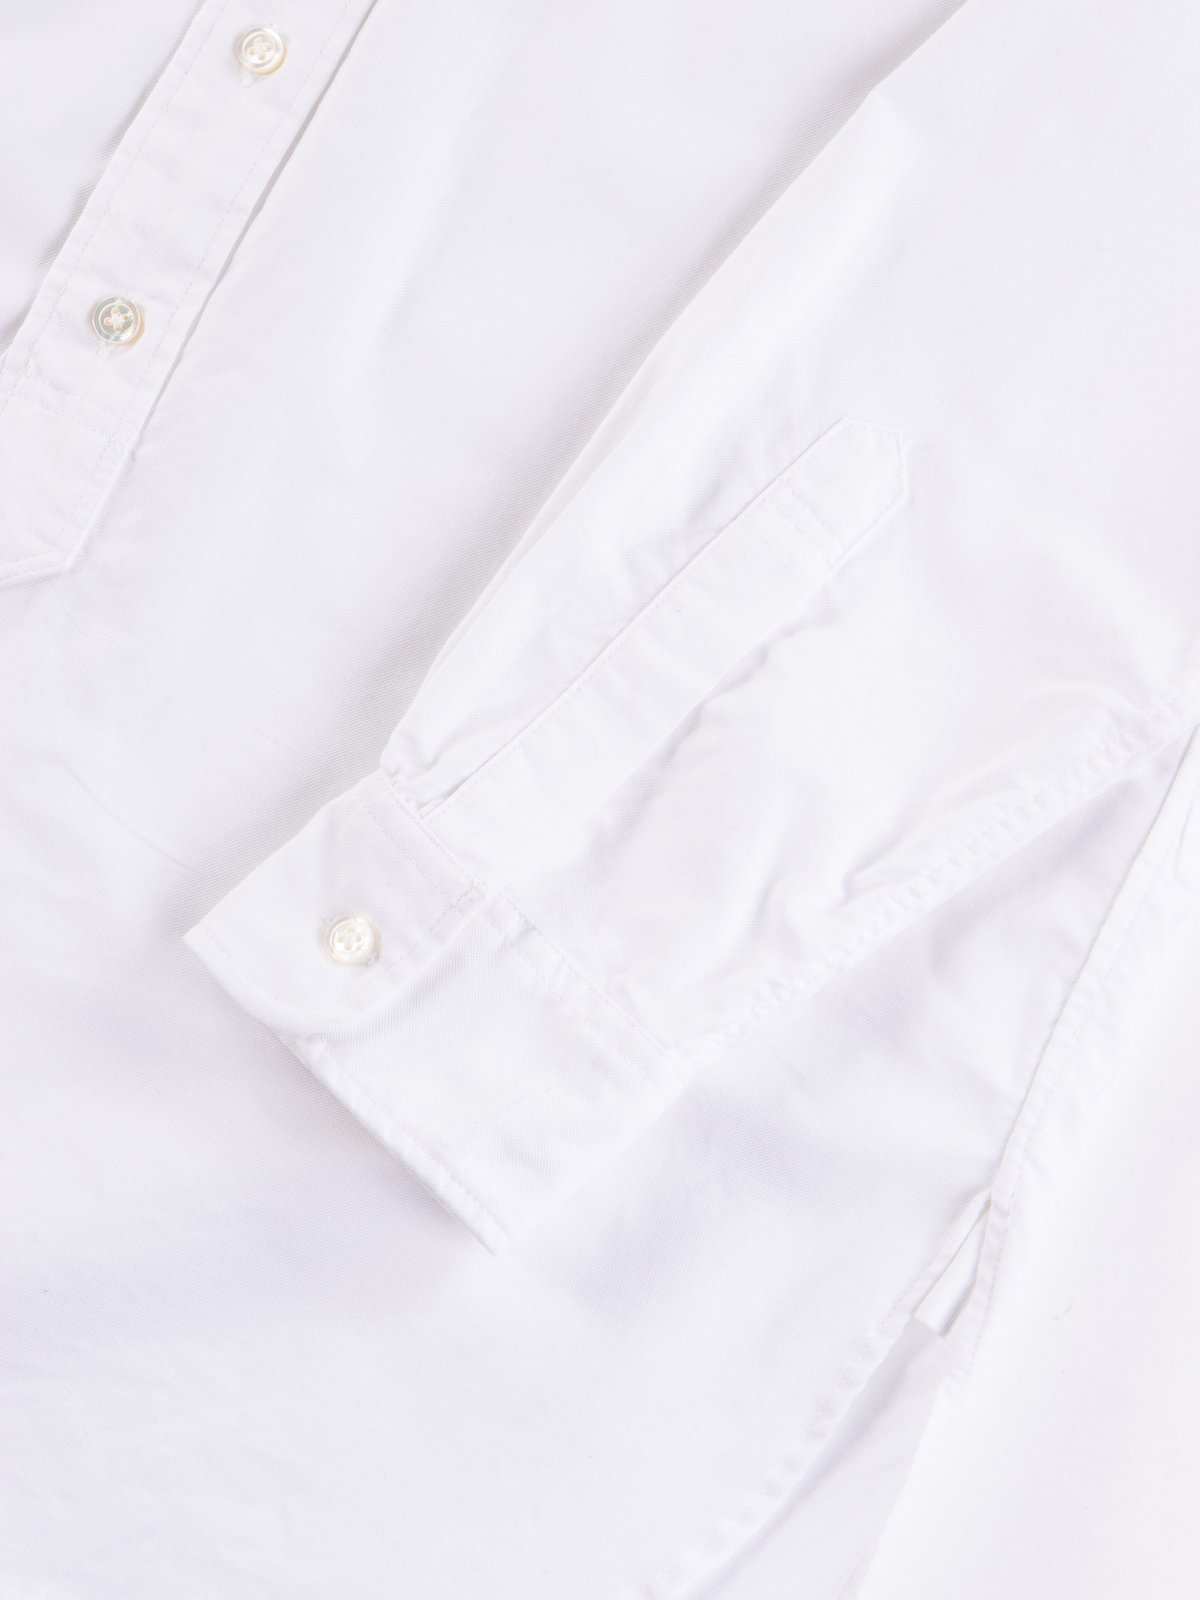 White Cotton Oxford 19th Century BD Shirt - Image 4